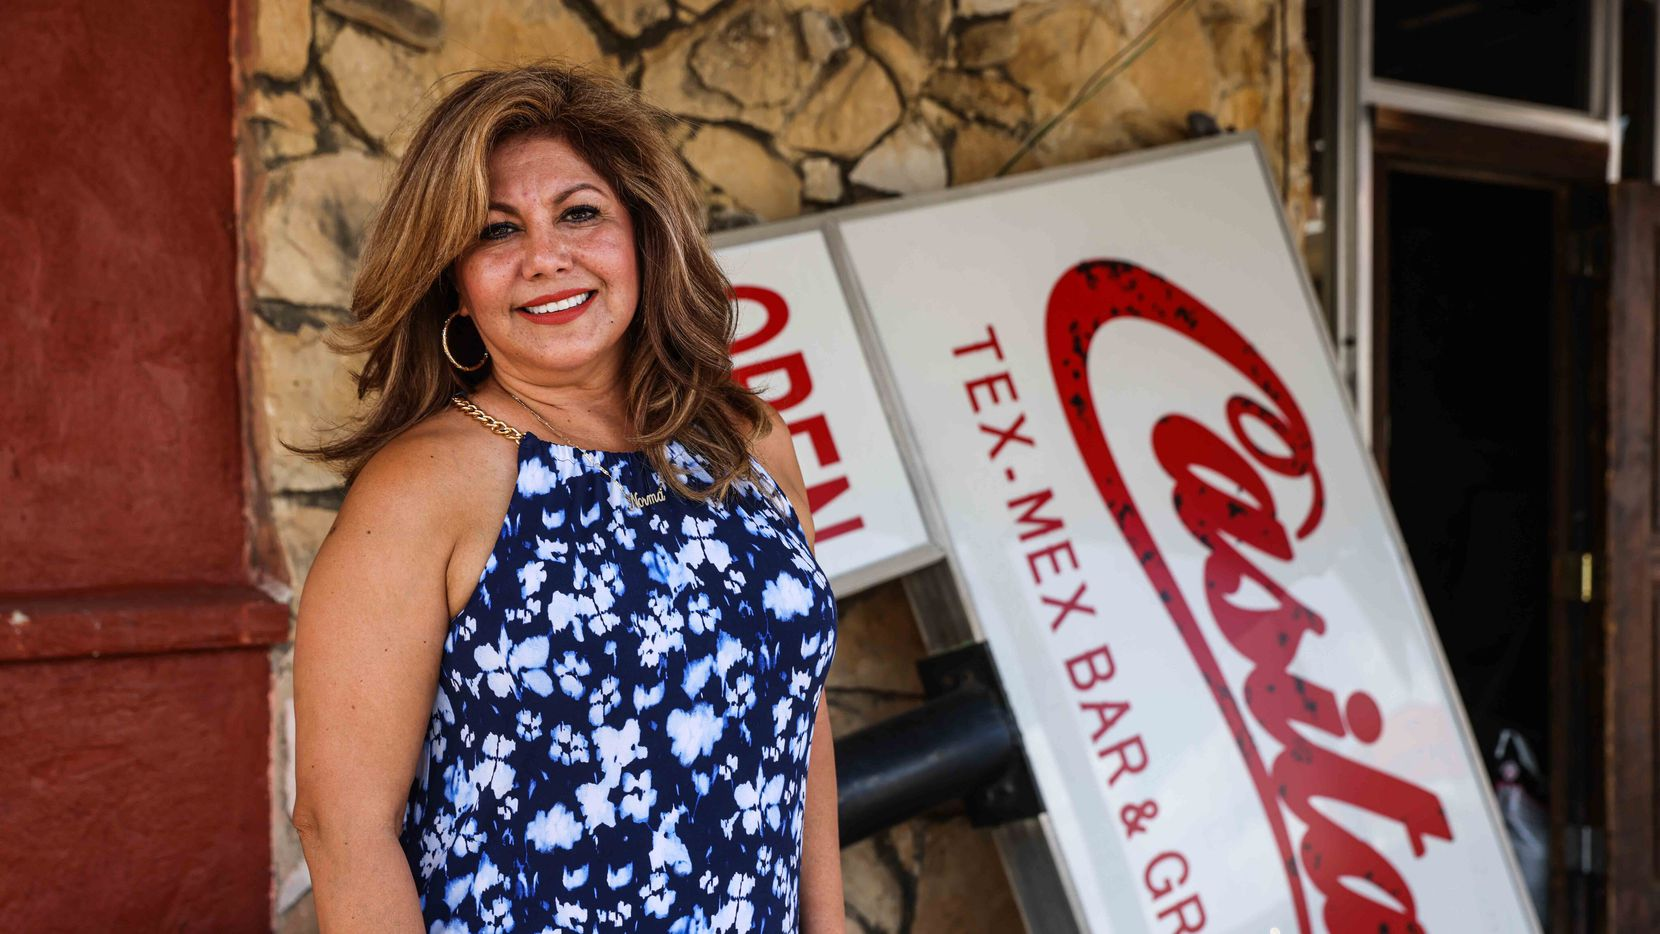 Norma Valles, Casita Tex-Mex owner, poses at her restaurant in Dallas.